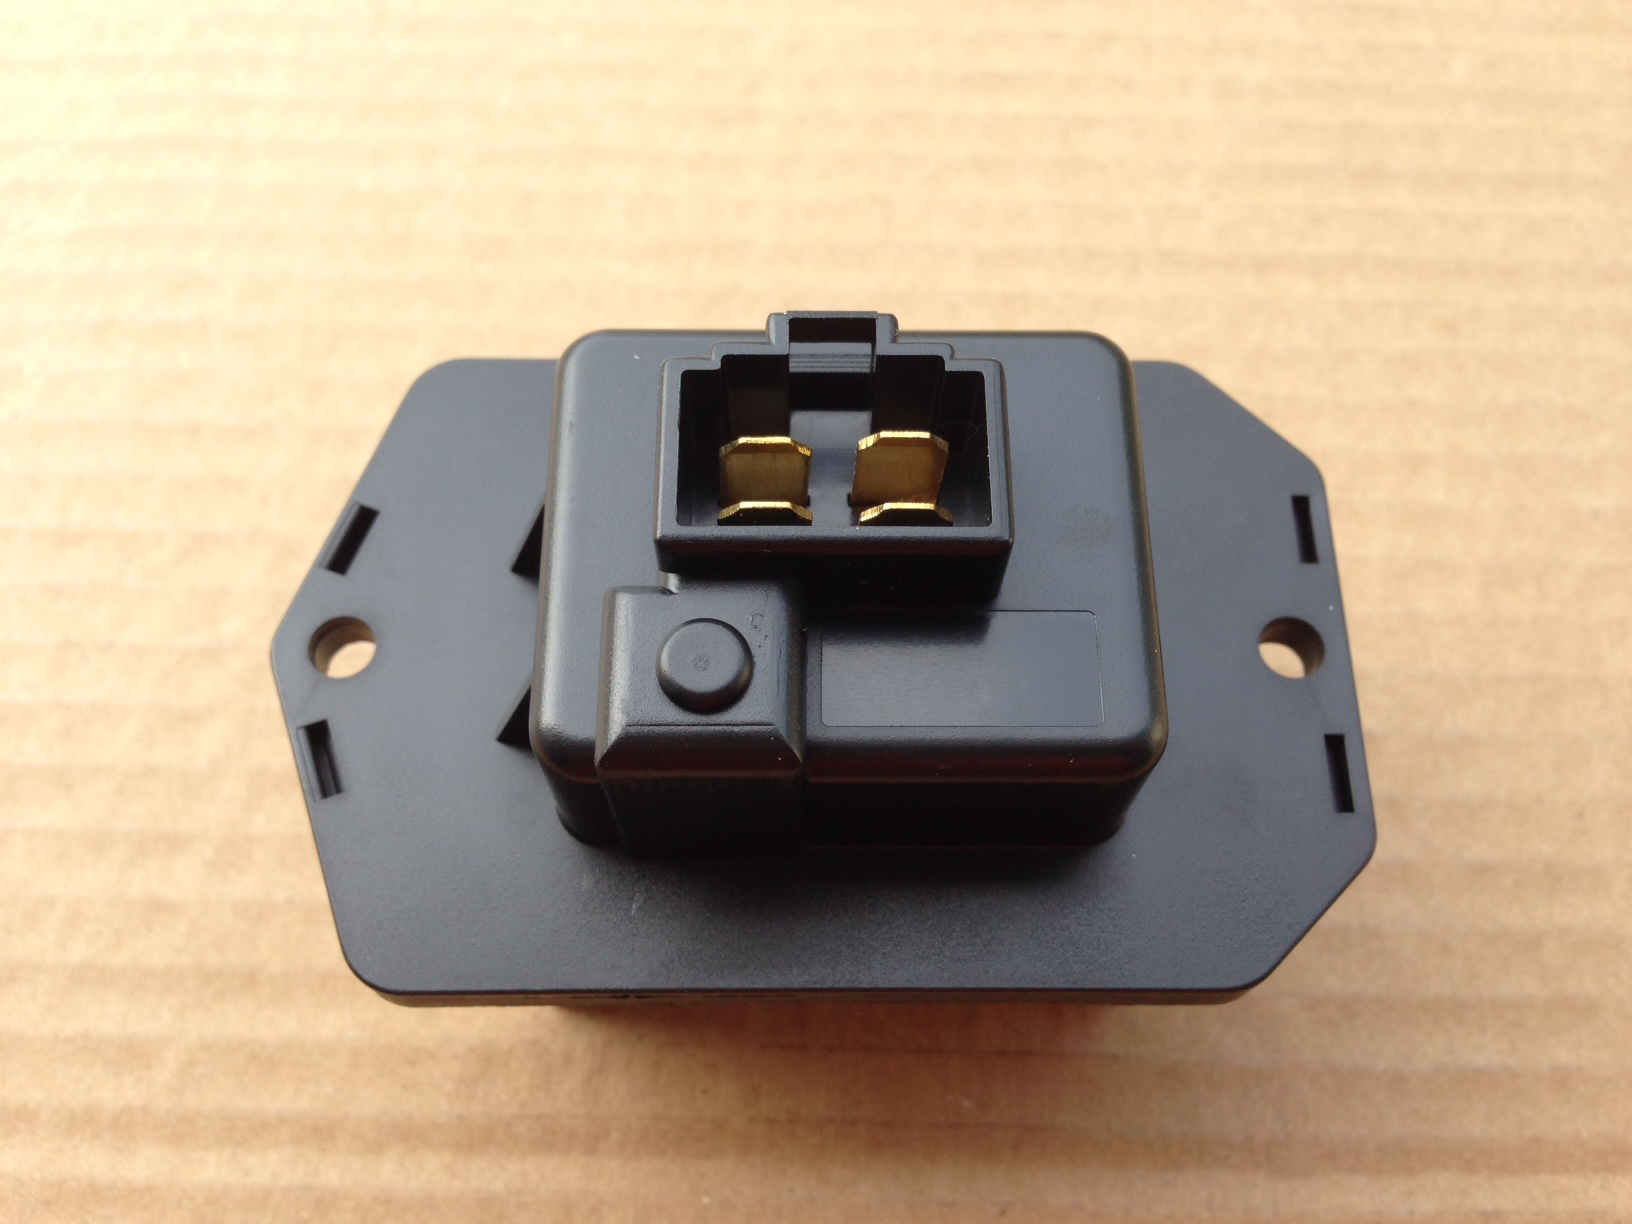 Oem 79330stxa01 new oem replacement hvac blower motor for Hvac blower motor replacement